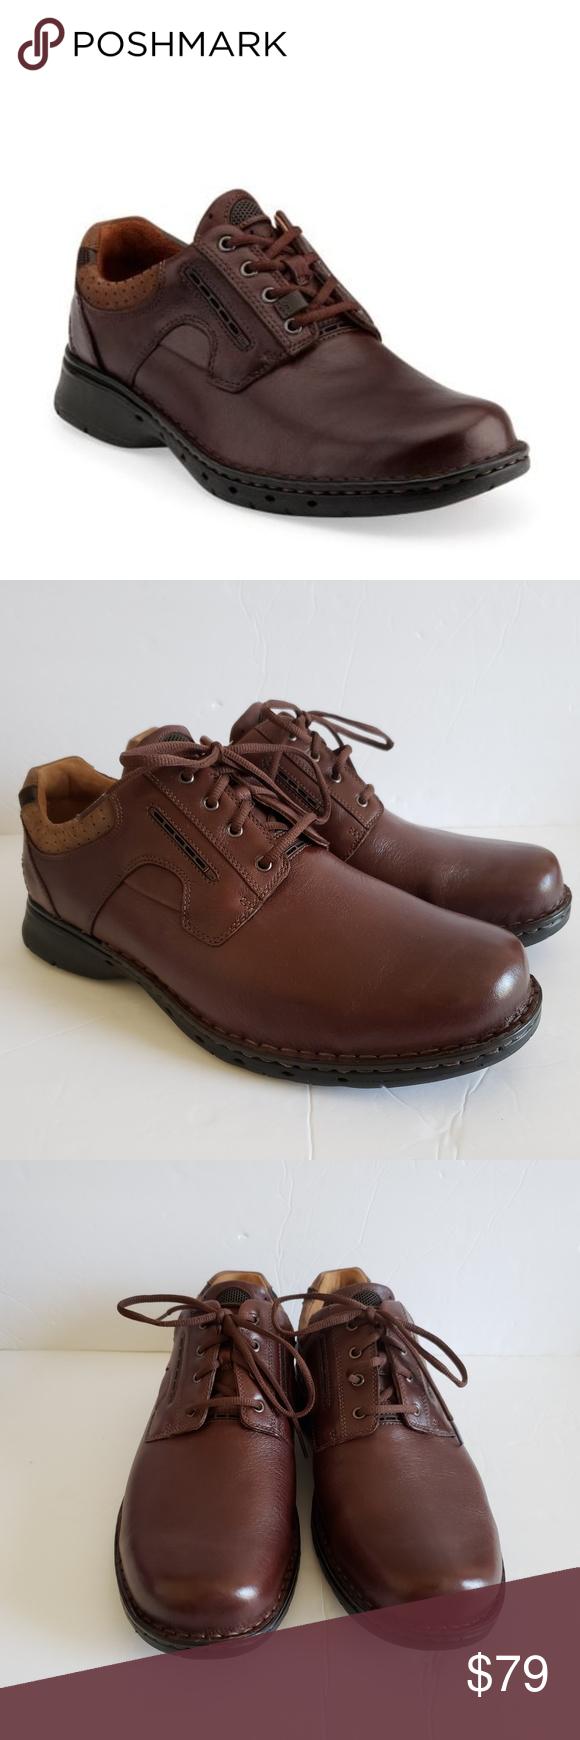 Clarks Unstructured Un.Ravel Brown Oxfords Shoes Oxford